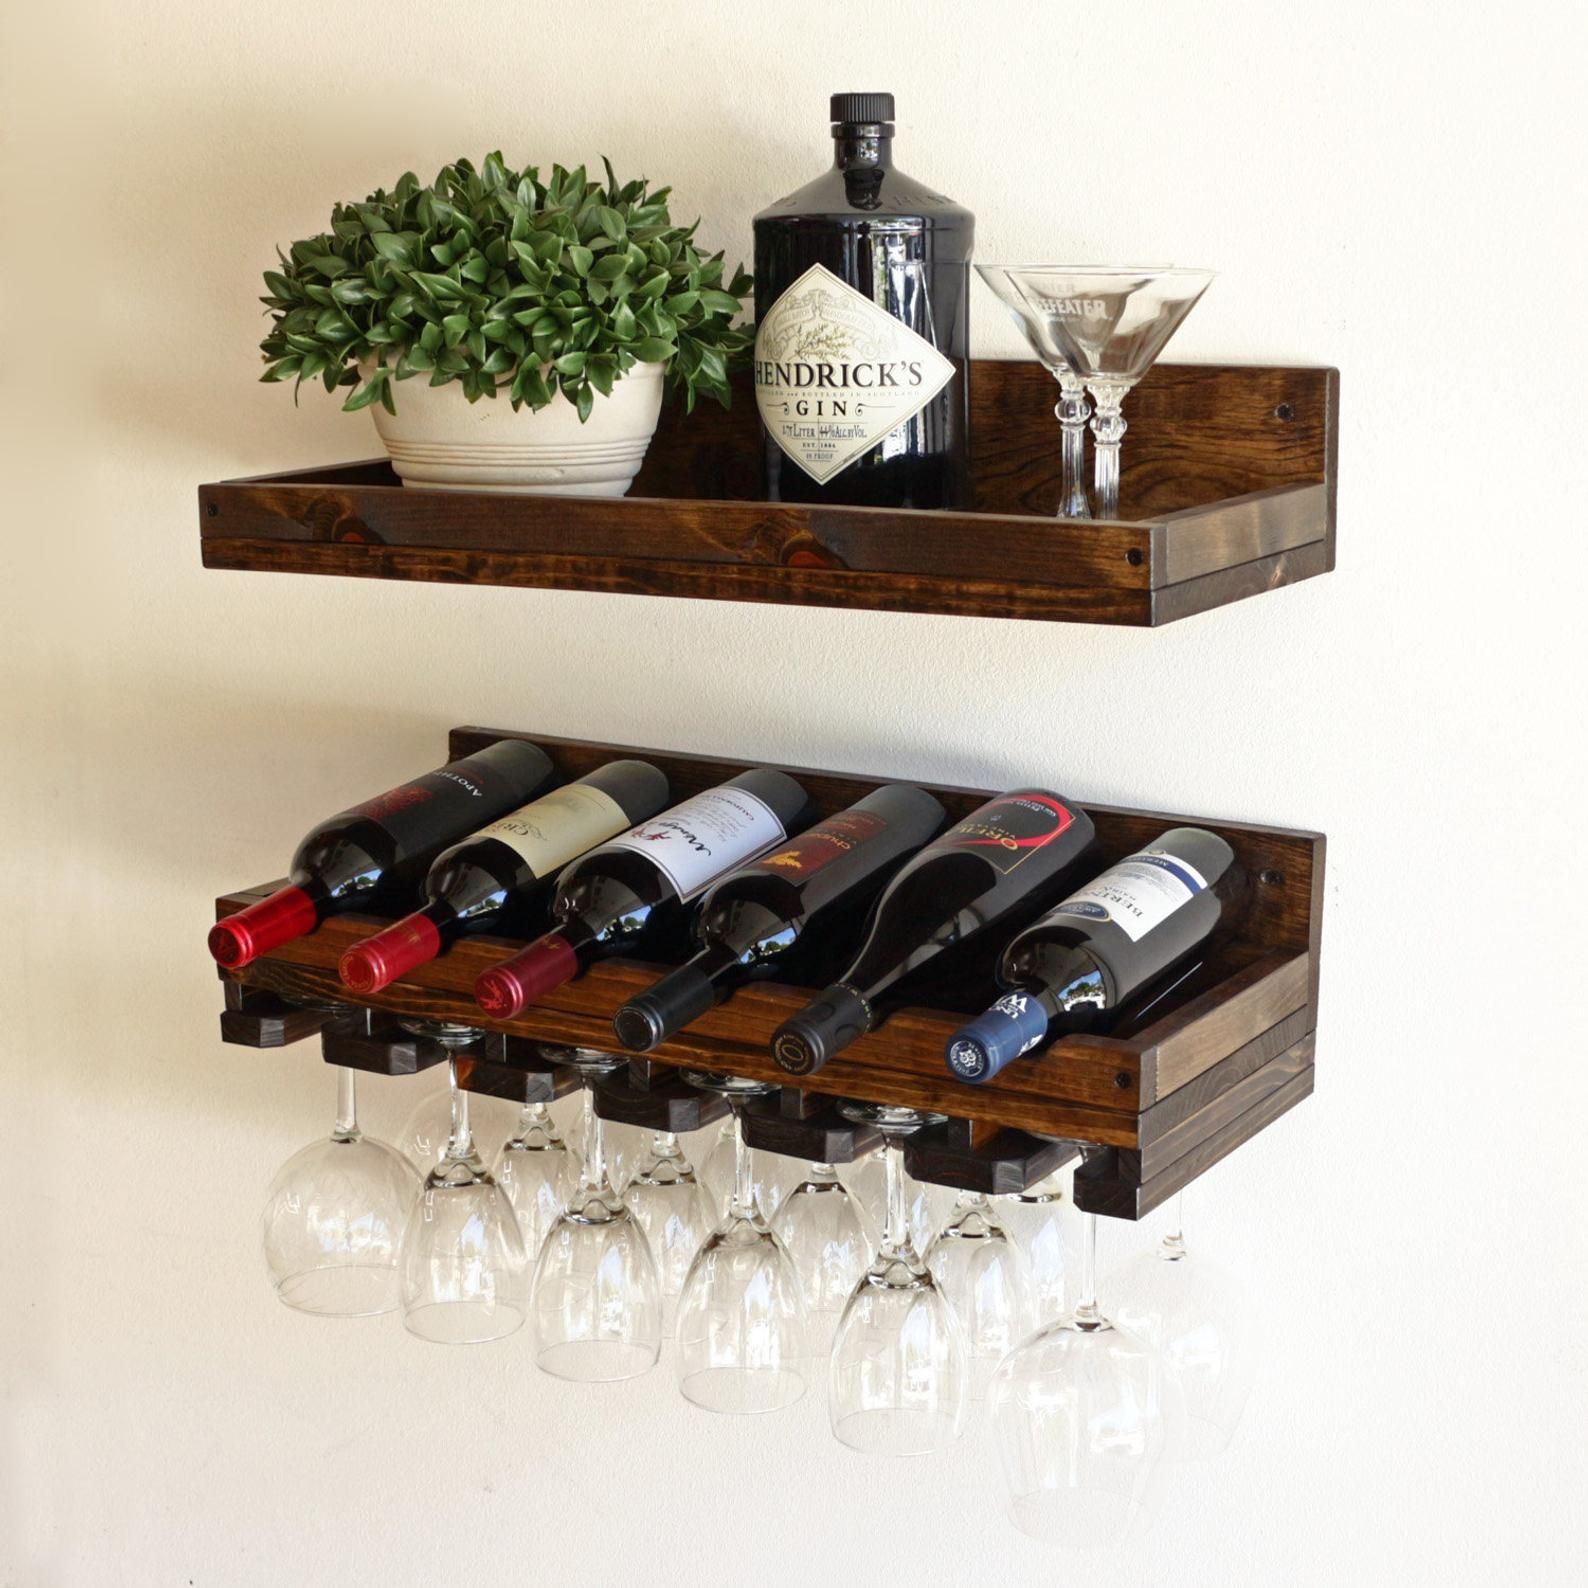 Rustic Wood Wine Rack Wall Mounted Shelf With Hanging Etsy In 2020 Wine Rack Wall Wine Bottle Shelf Wine Bottle Display